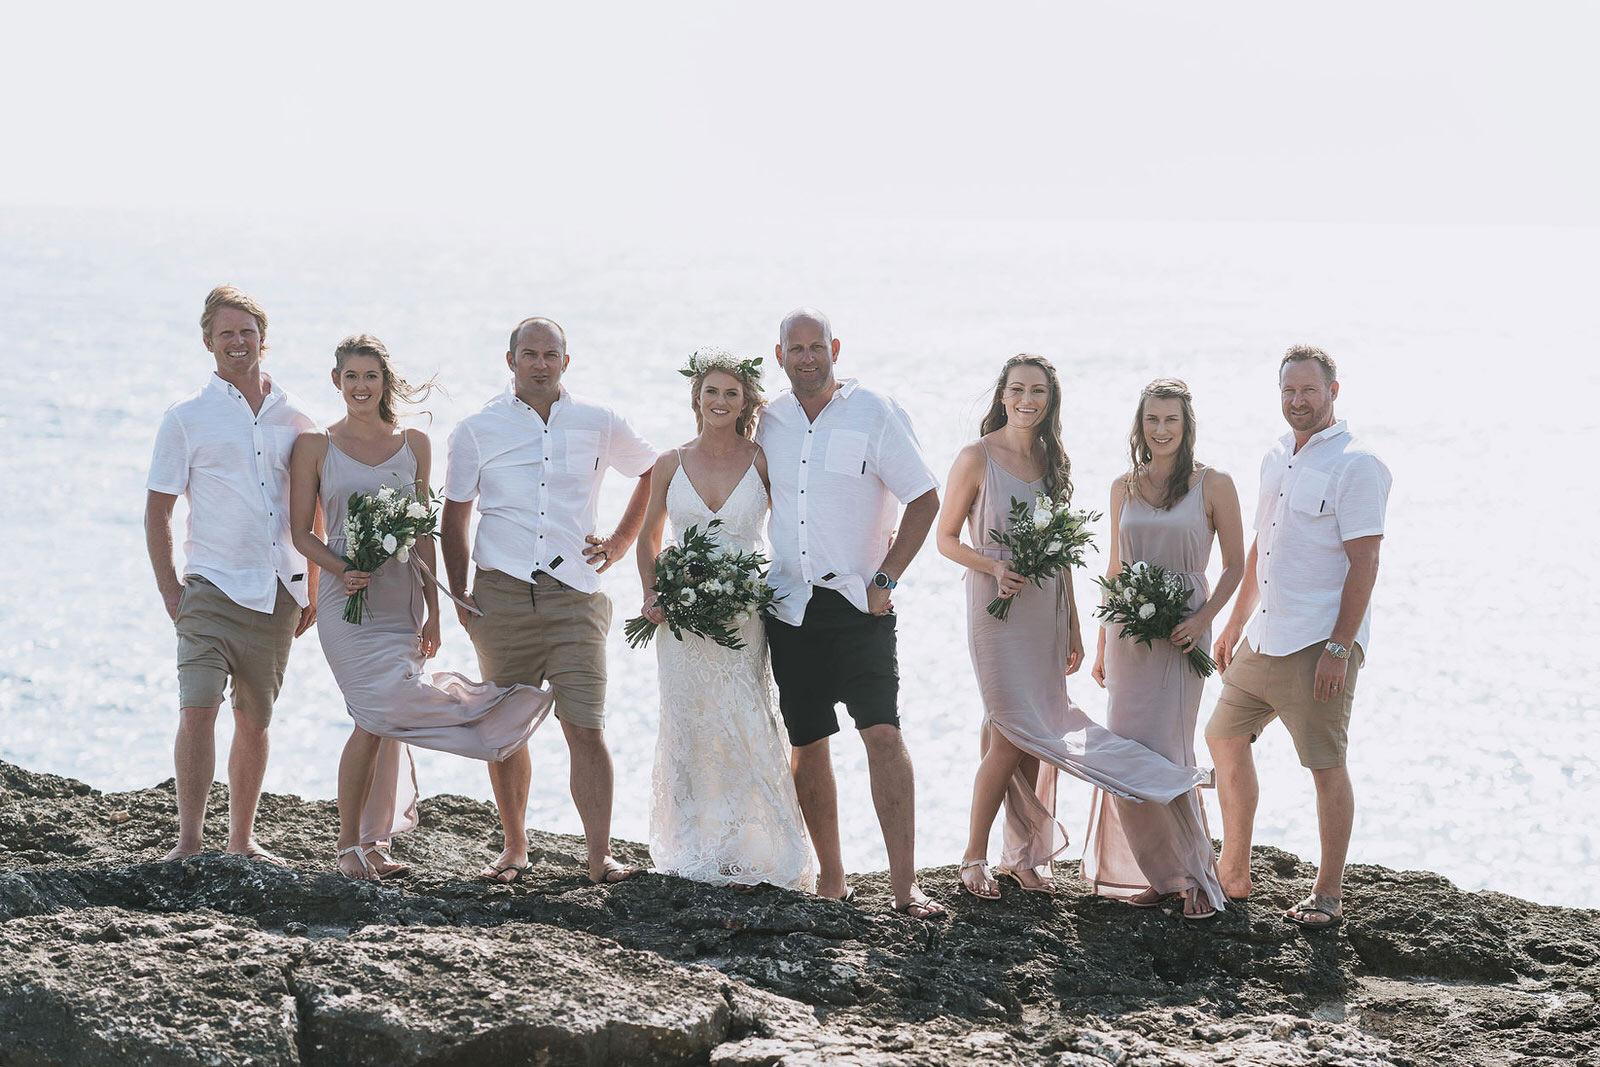 newfound-hai-tide-nusa-lembongan-bali-wedding-photographers-097